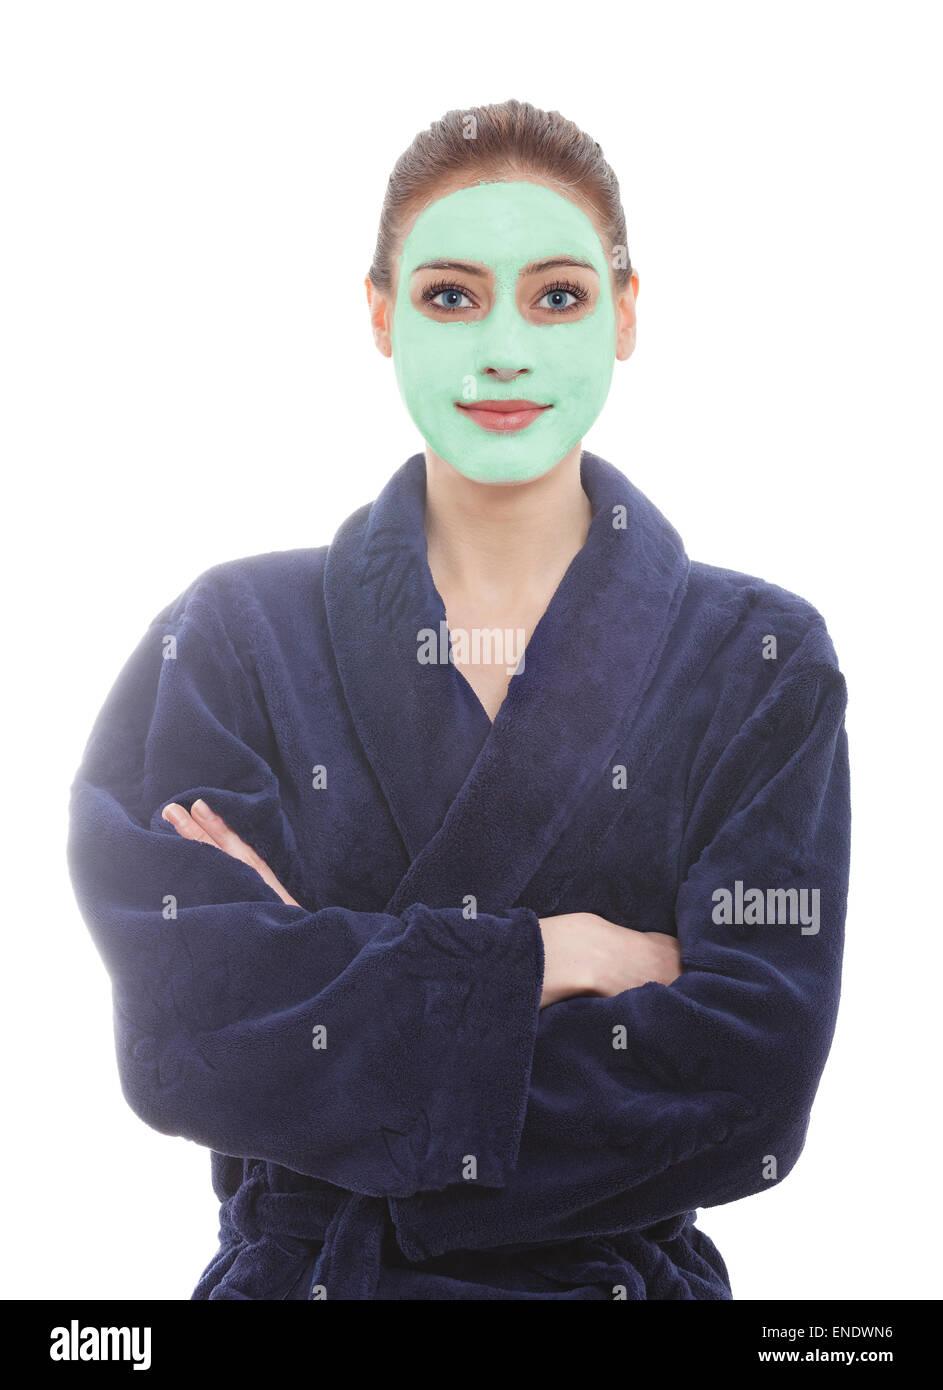 Junge Frau trägt Morgenmantel mit Gesichts-Maske, Spa und Beauty-Konzept. Stockbild